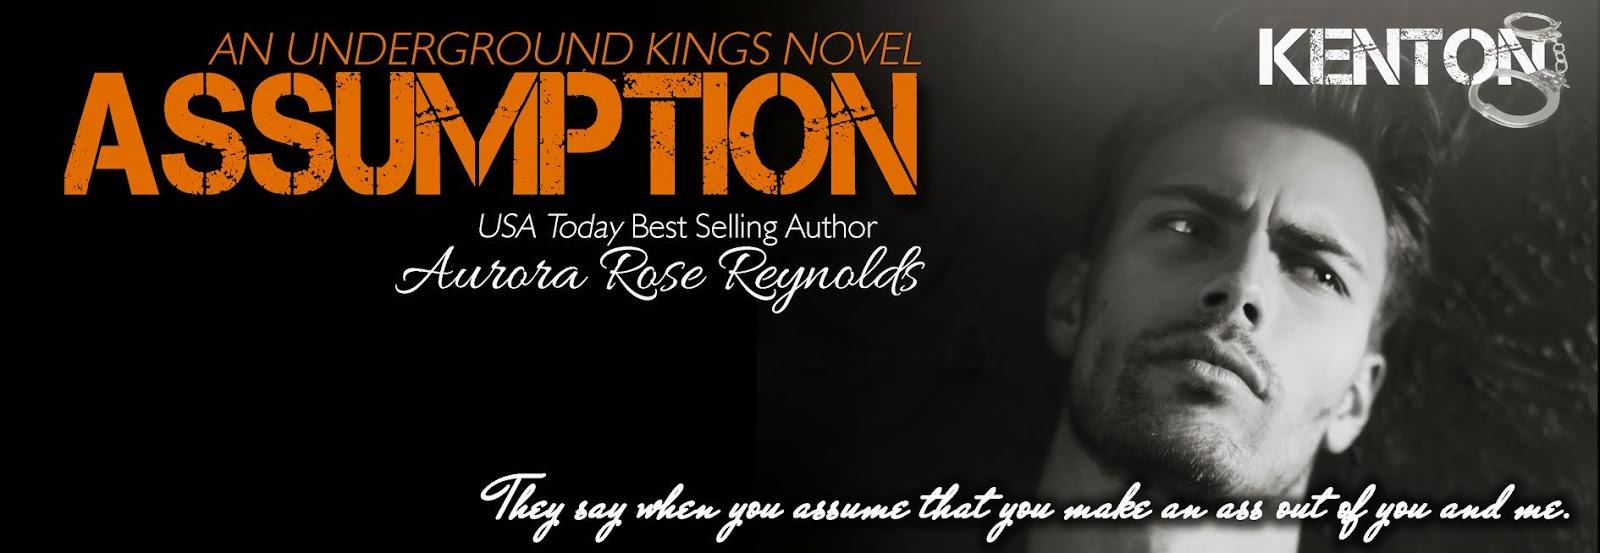 Blog Tour: Book Spotlight + Giveaway – Assumptions by Aurora Rose Reynolds